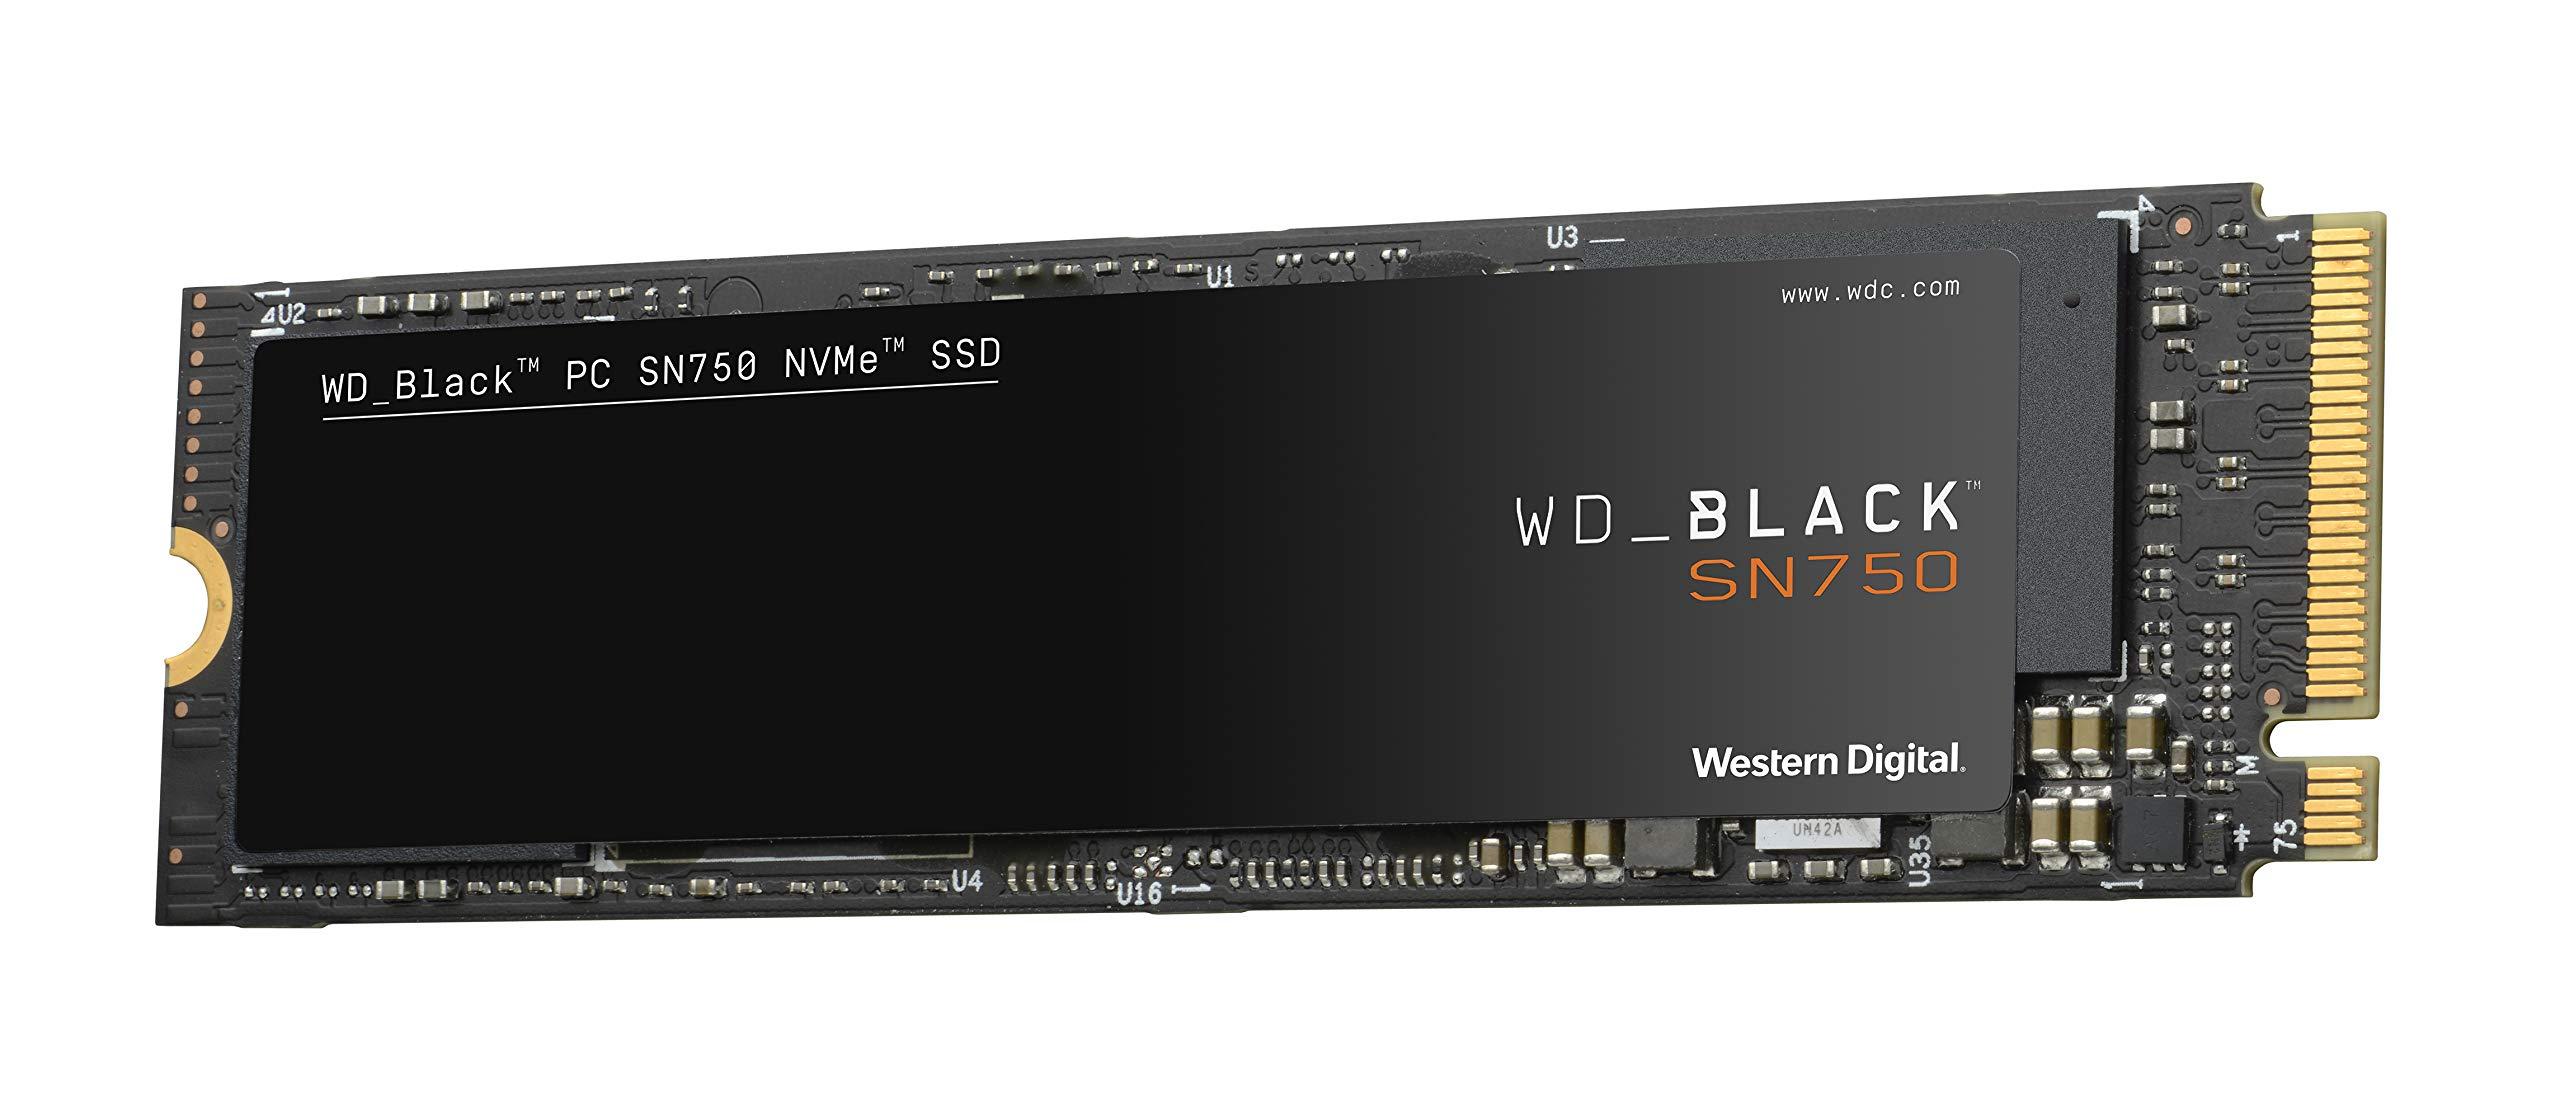 WD BLACK SN750 1TB NVMe Internal Gaming SSD - Gen3 PCIe, M.2 2280, 3D NAND - WDS100T3X0C by Western Digital (Image #3)